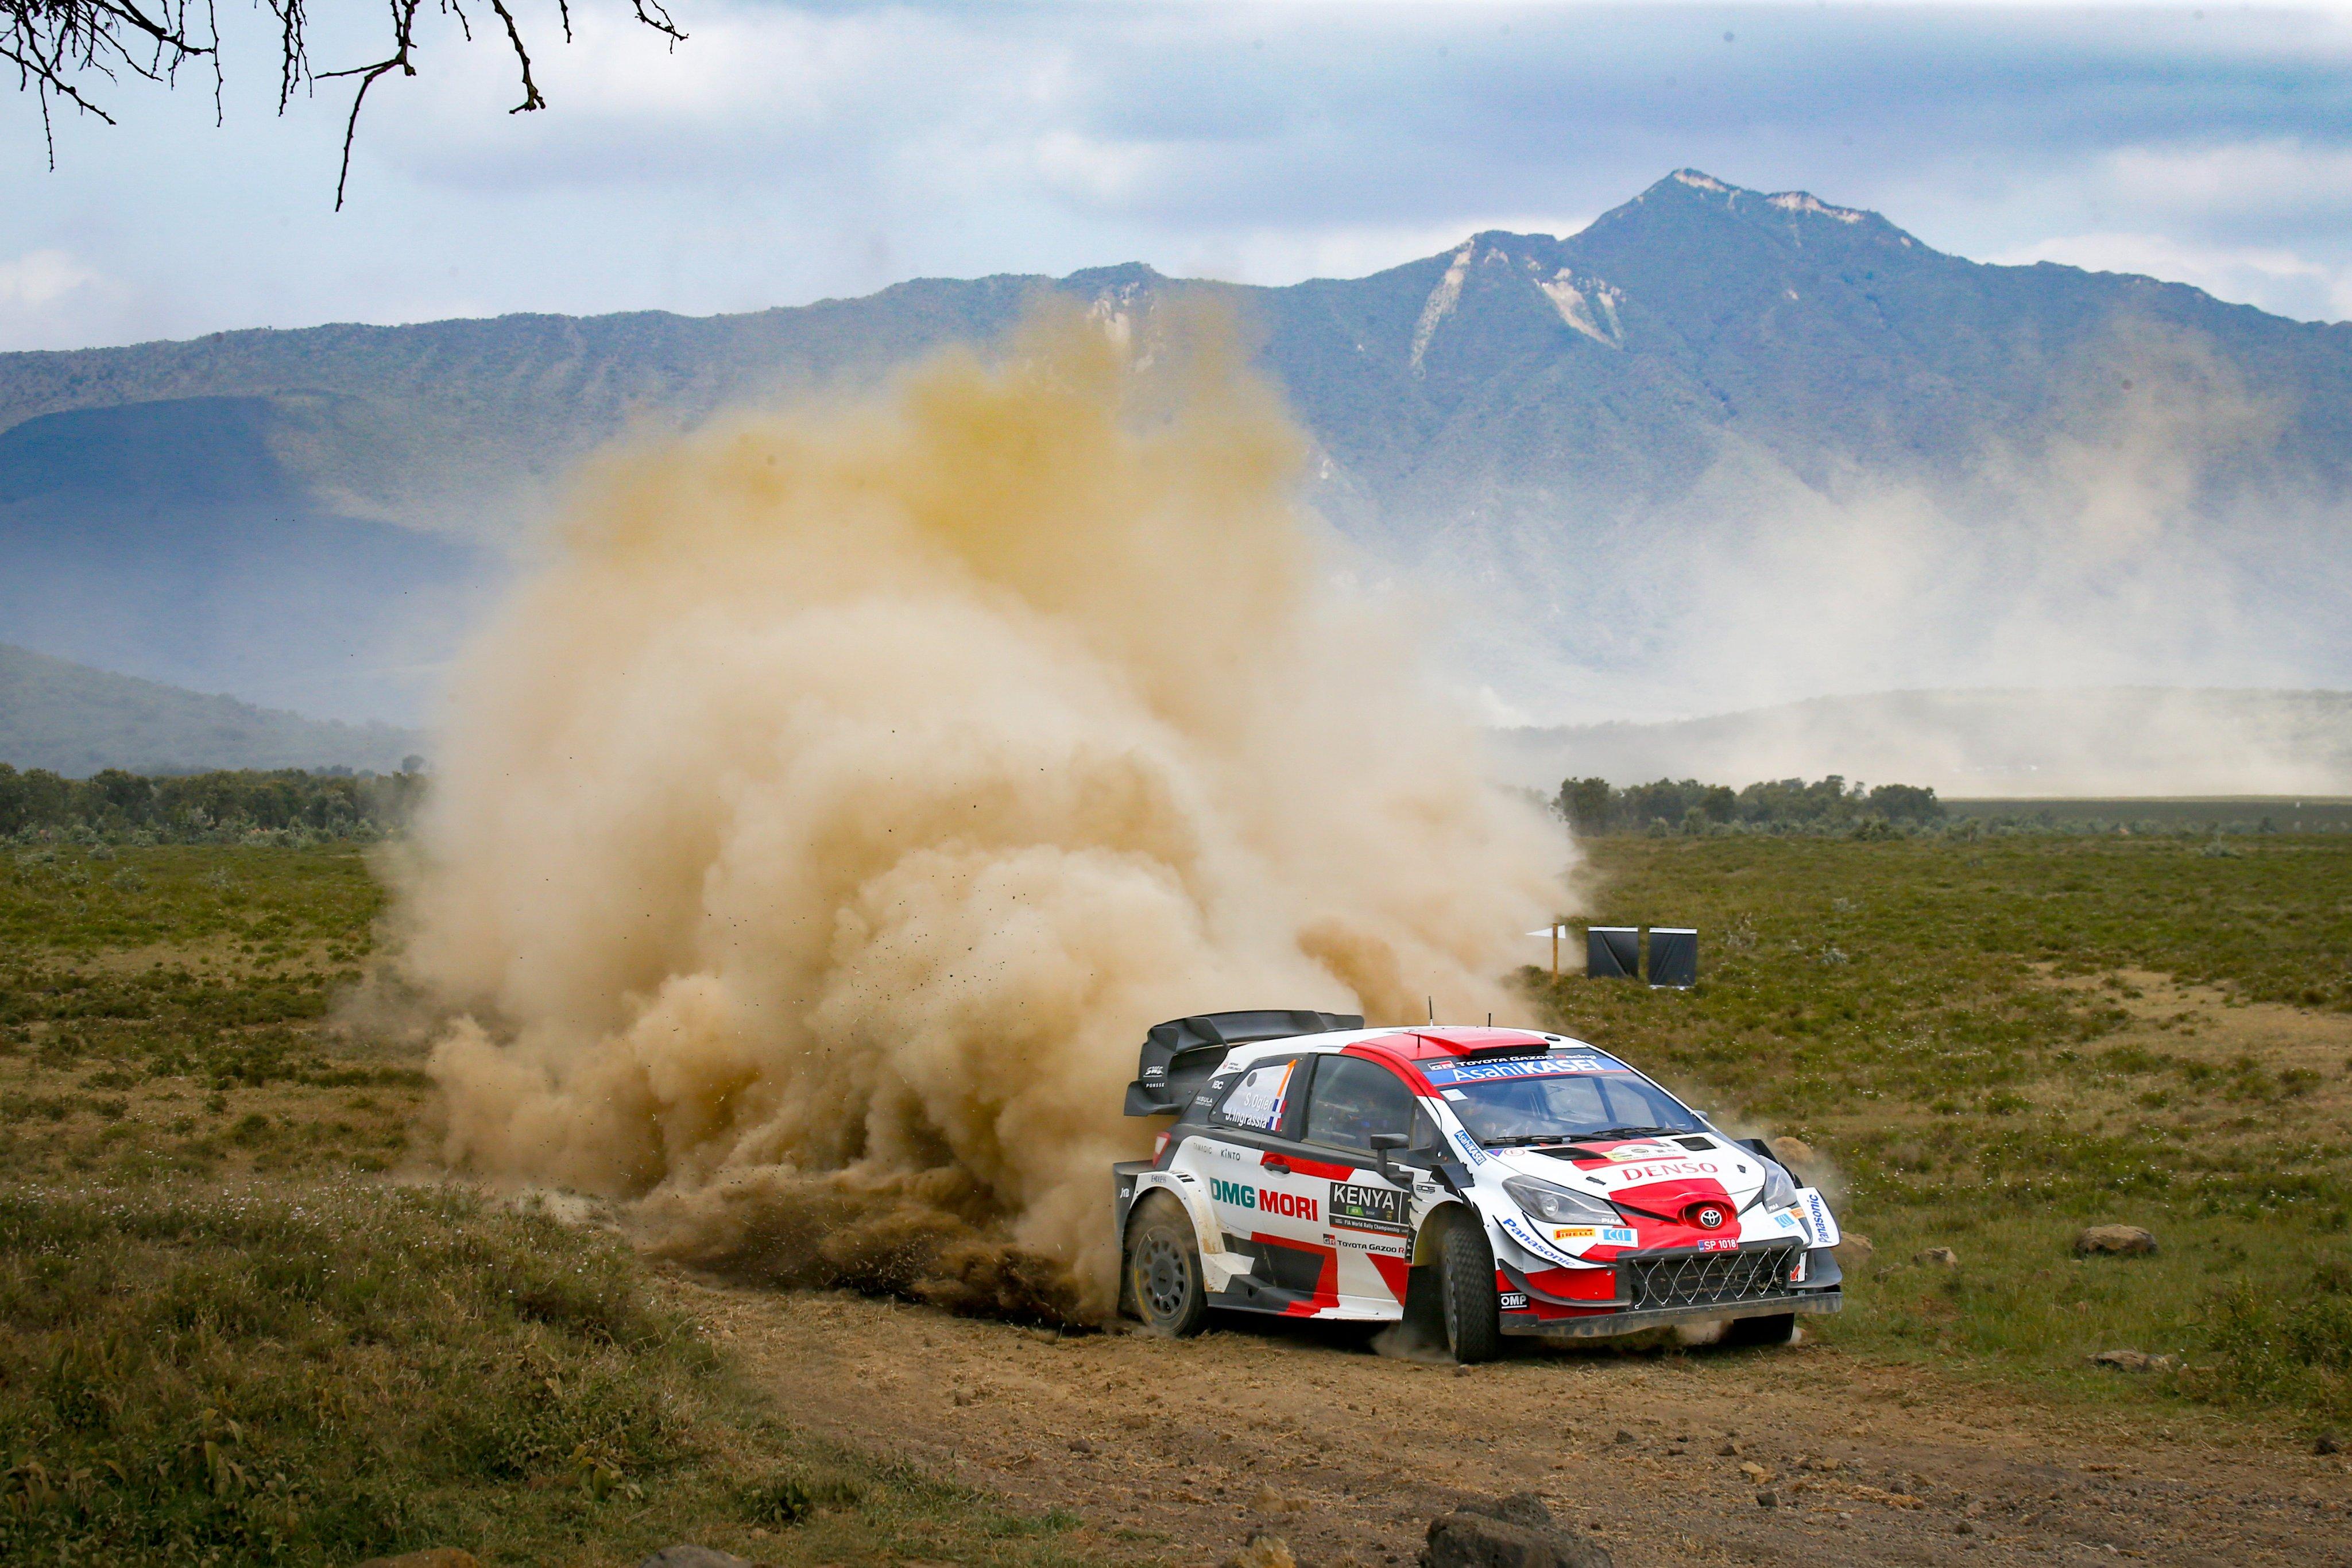 WRC: Safari Rally Kenya [23-27 Junio] - Página 4 E4ykOK5X0AcM8Ma?format=jpg&name=4096x4096